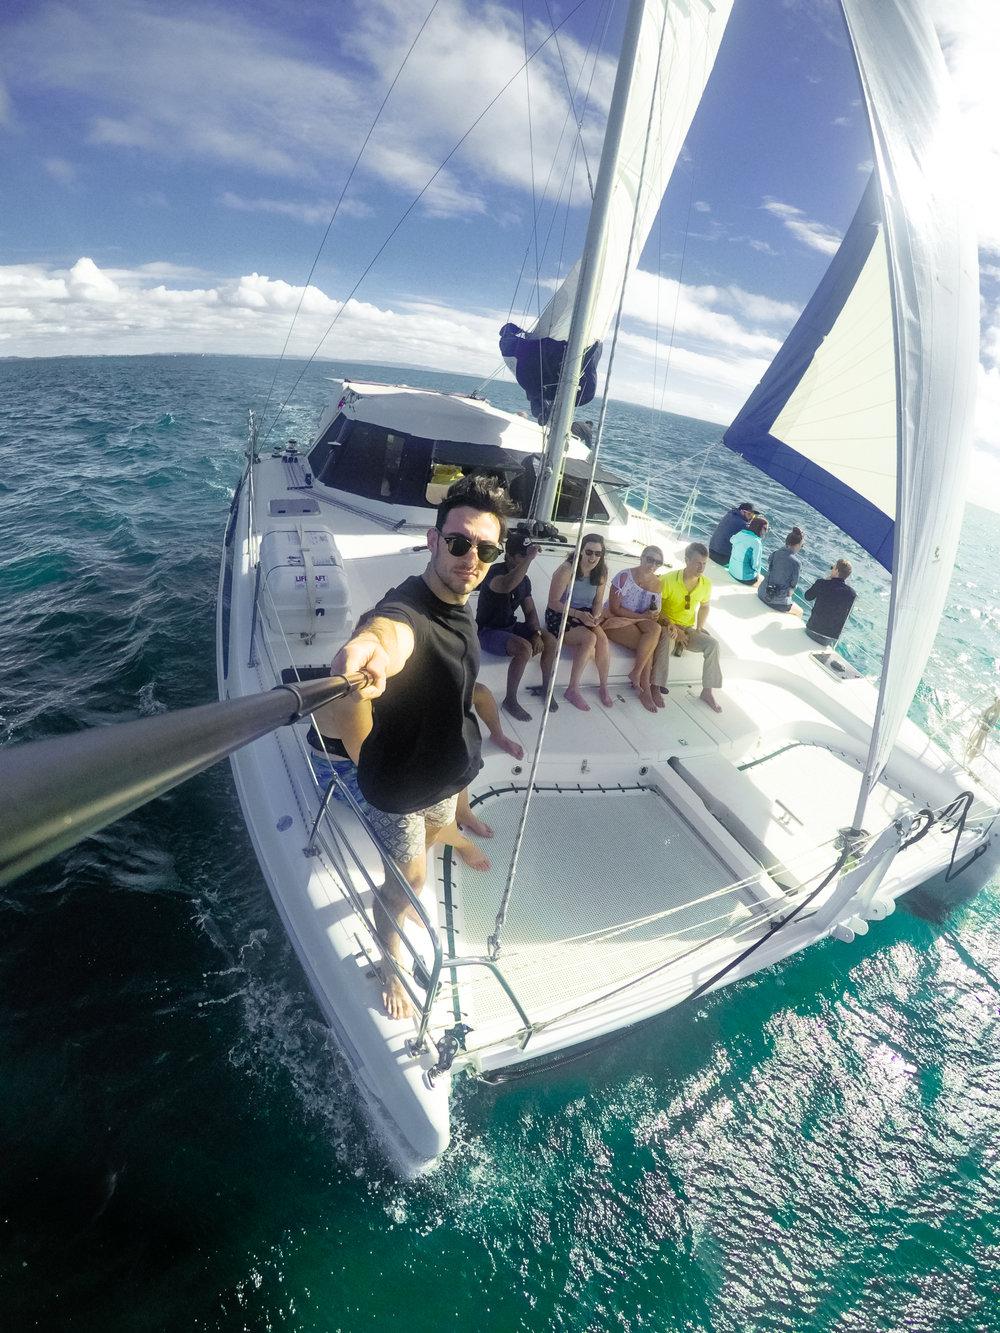 Onboard the catamaran